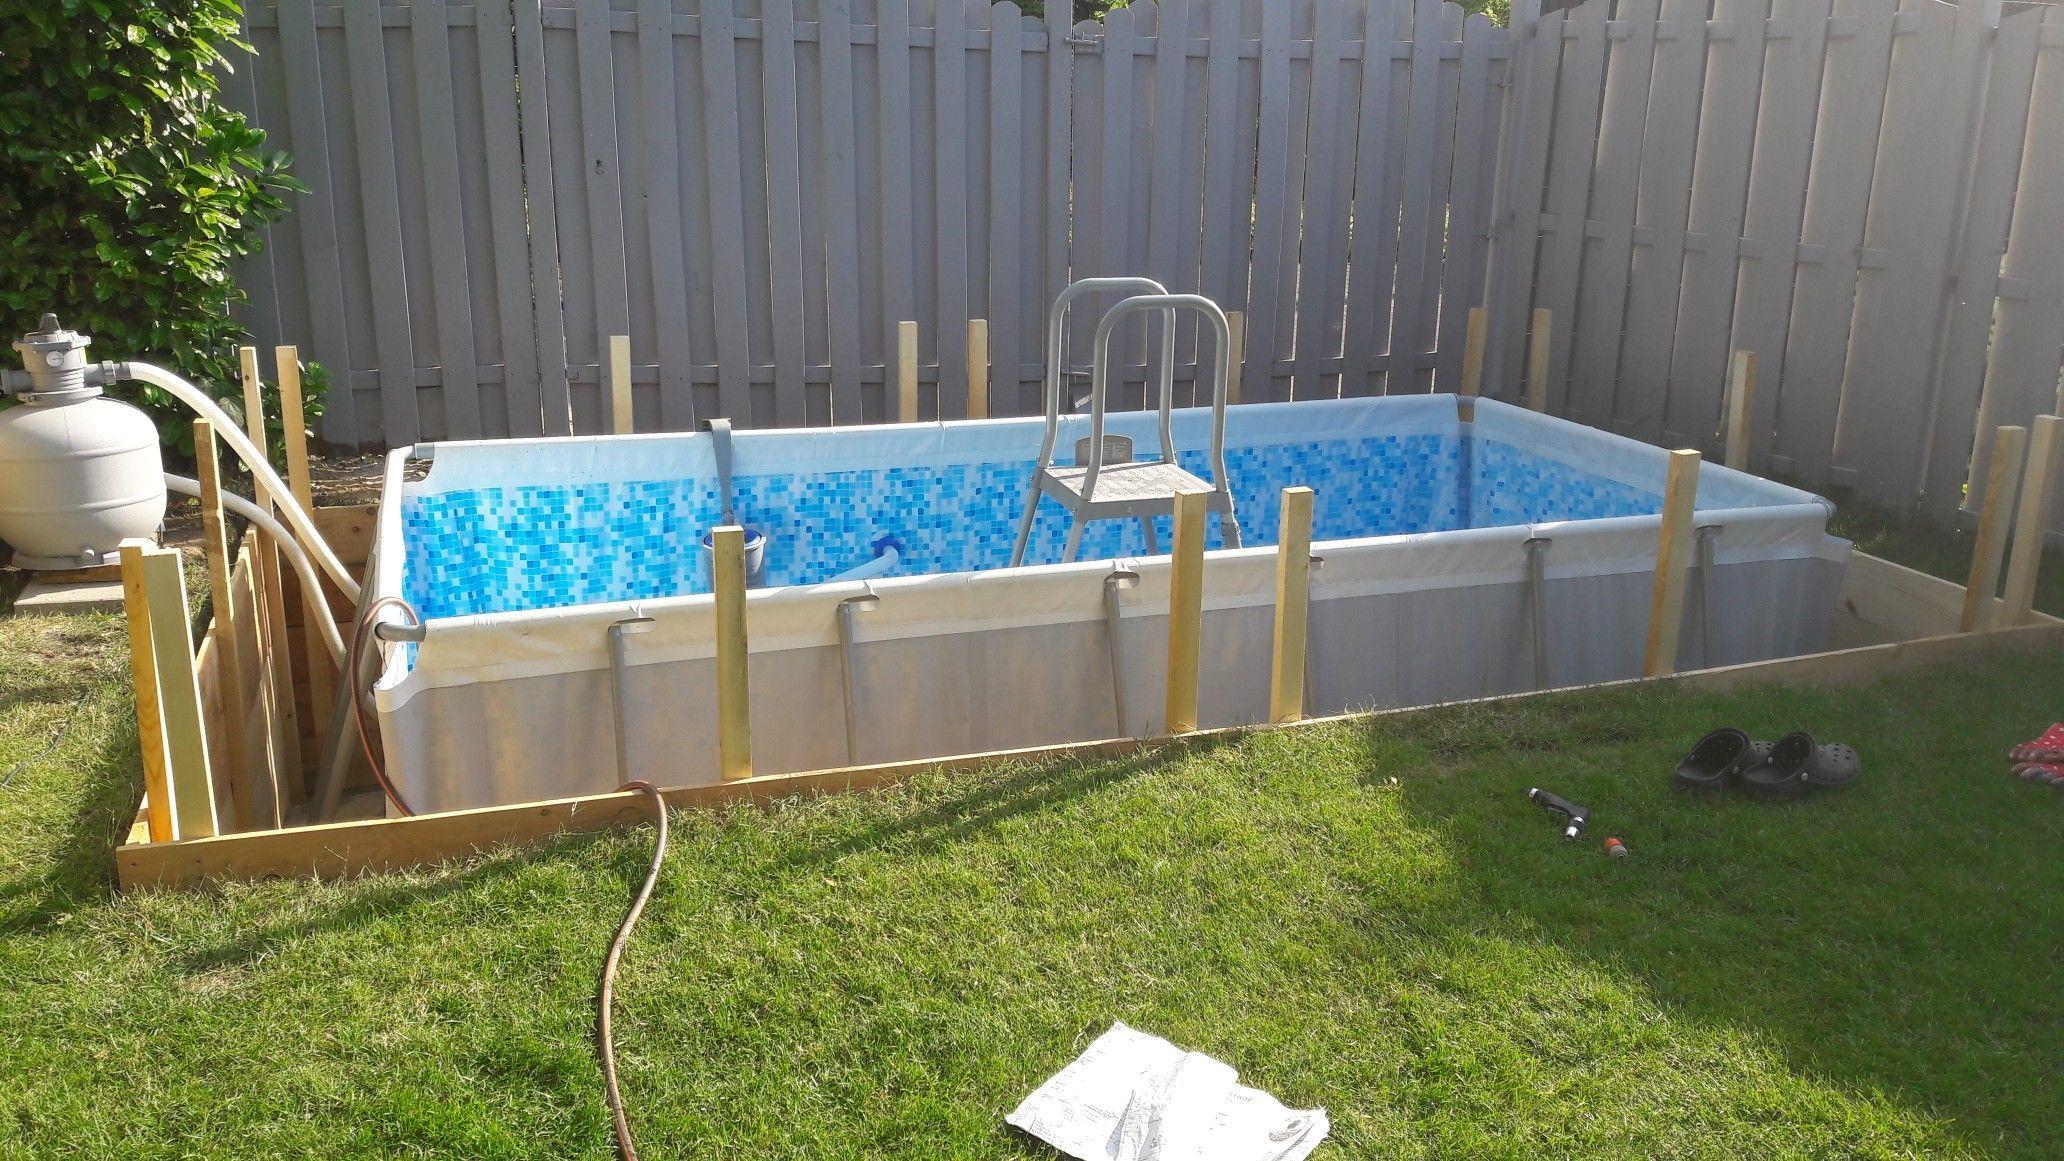 Poolpool Garten Pool Selber Bauen Schwimmbader Hinterhof Pool Selber Bauen